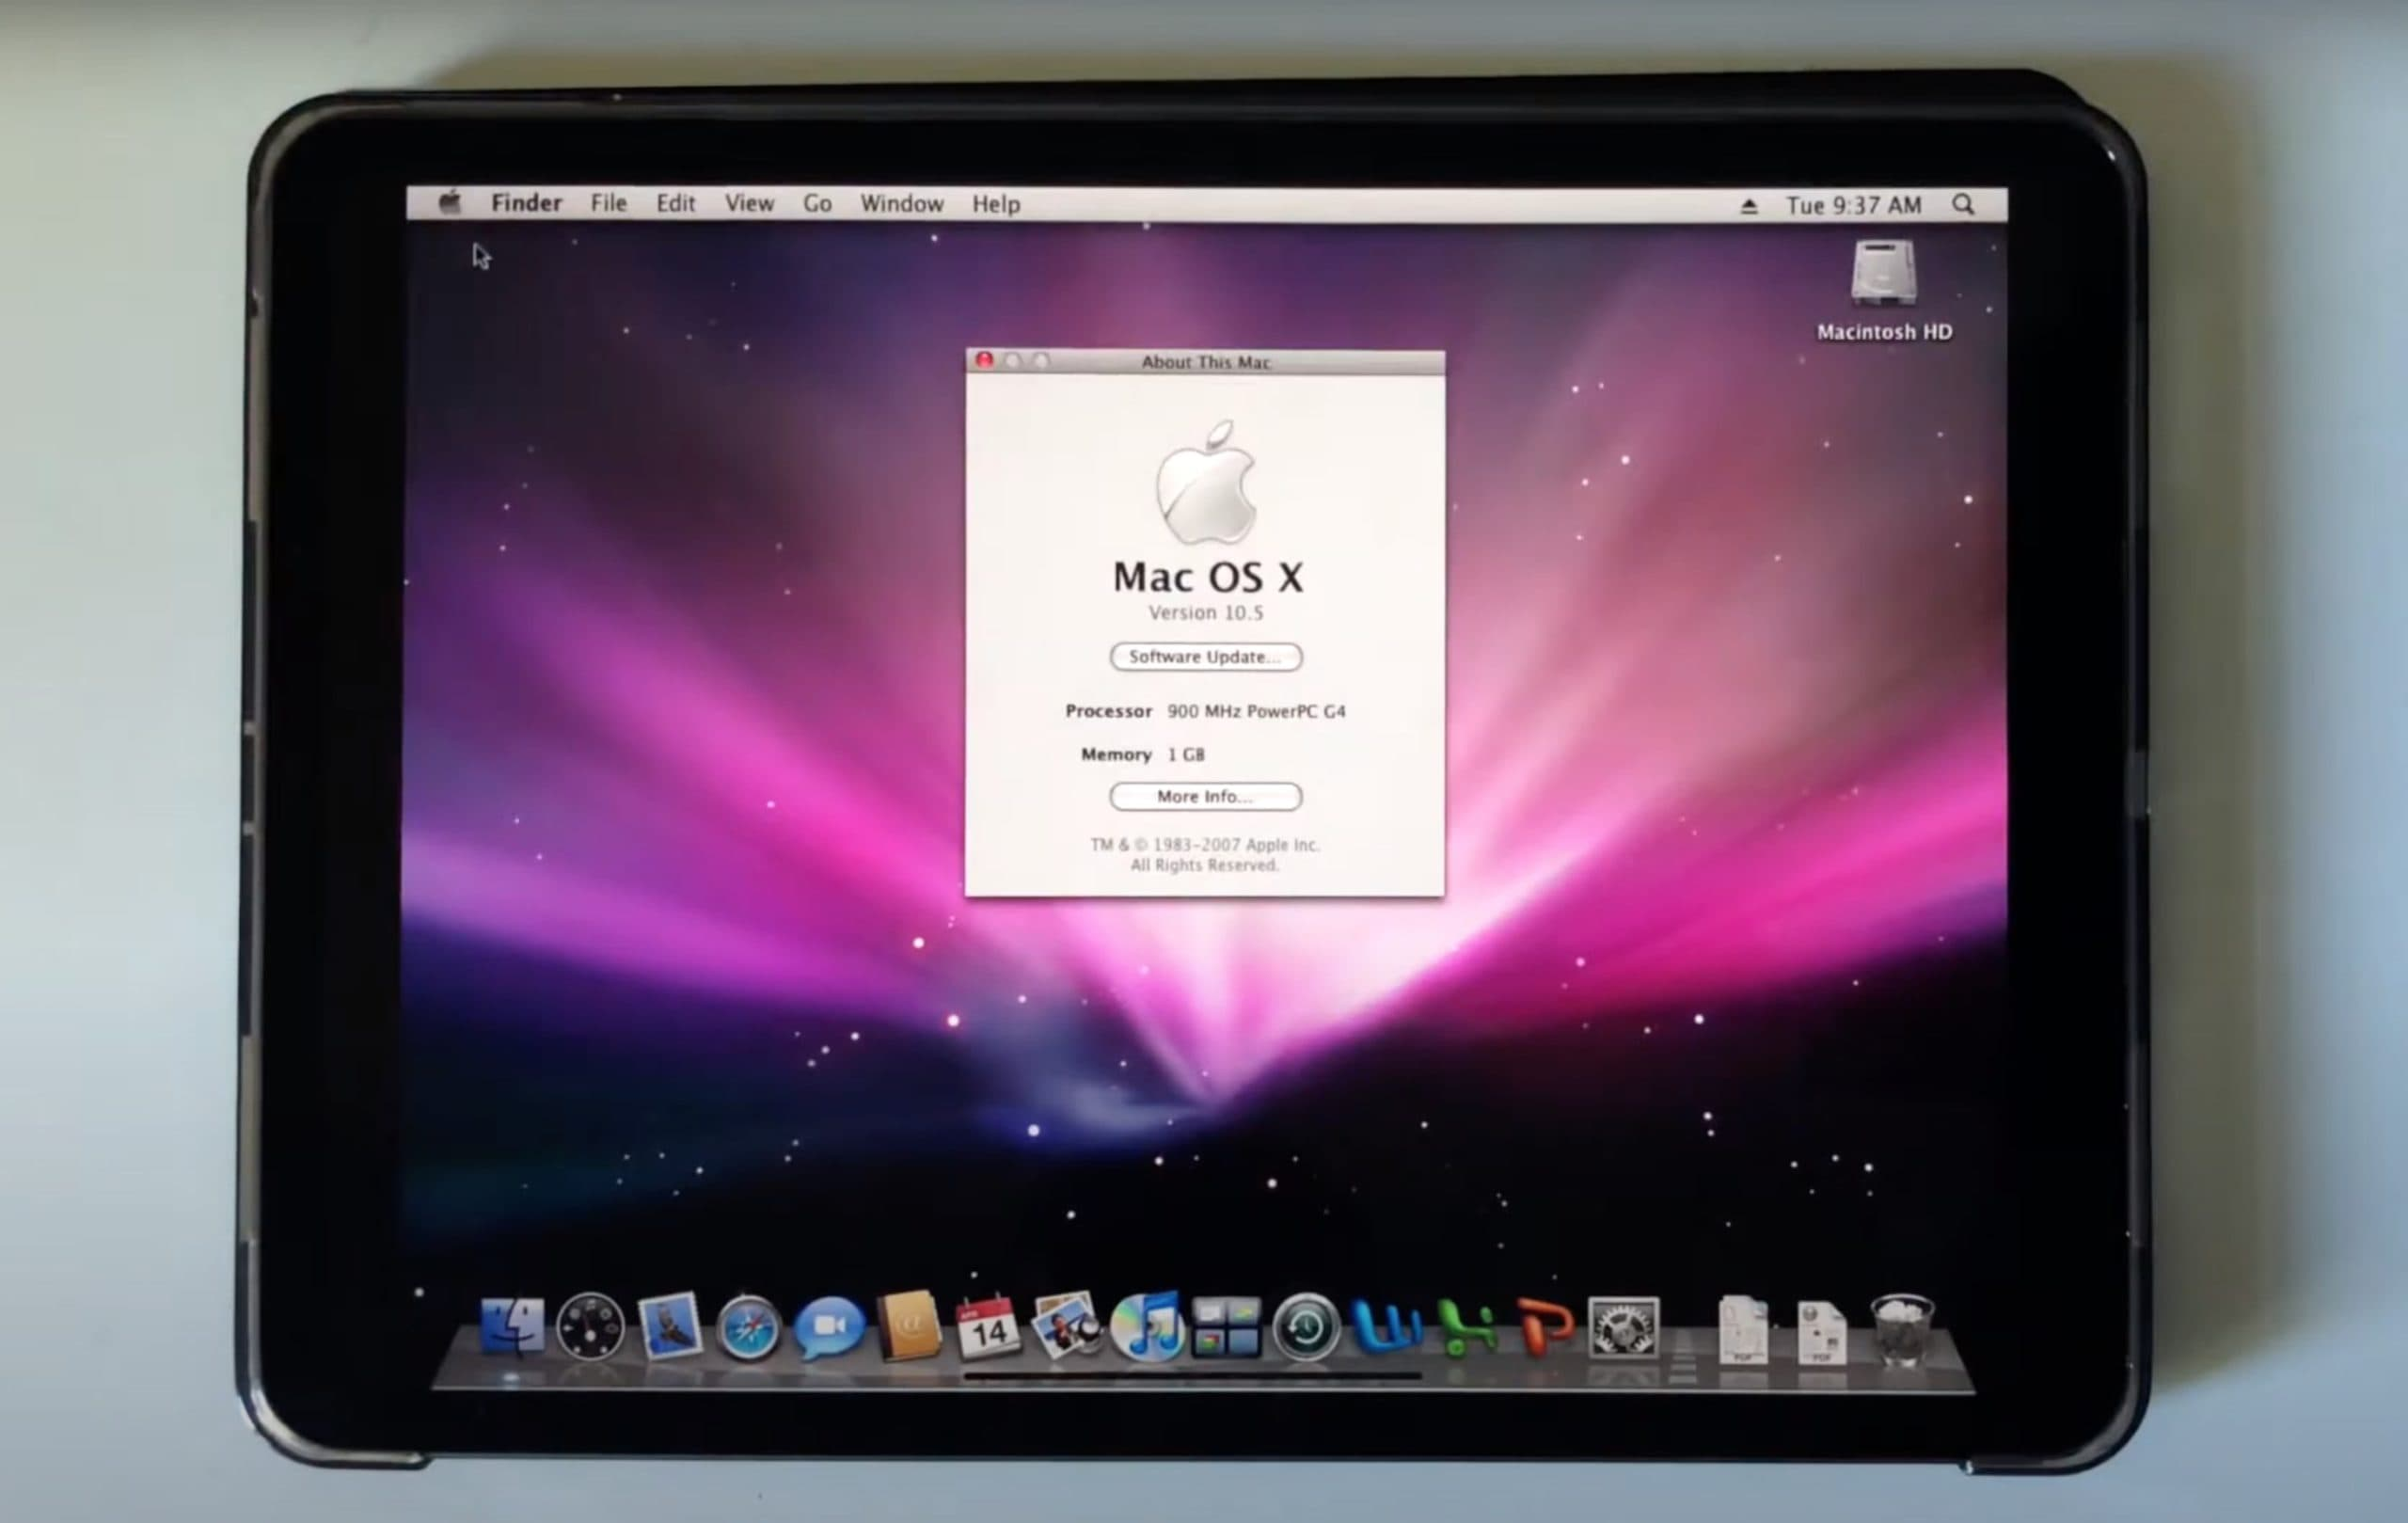 Mac OS X Leopard rodando num iPad Pro